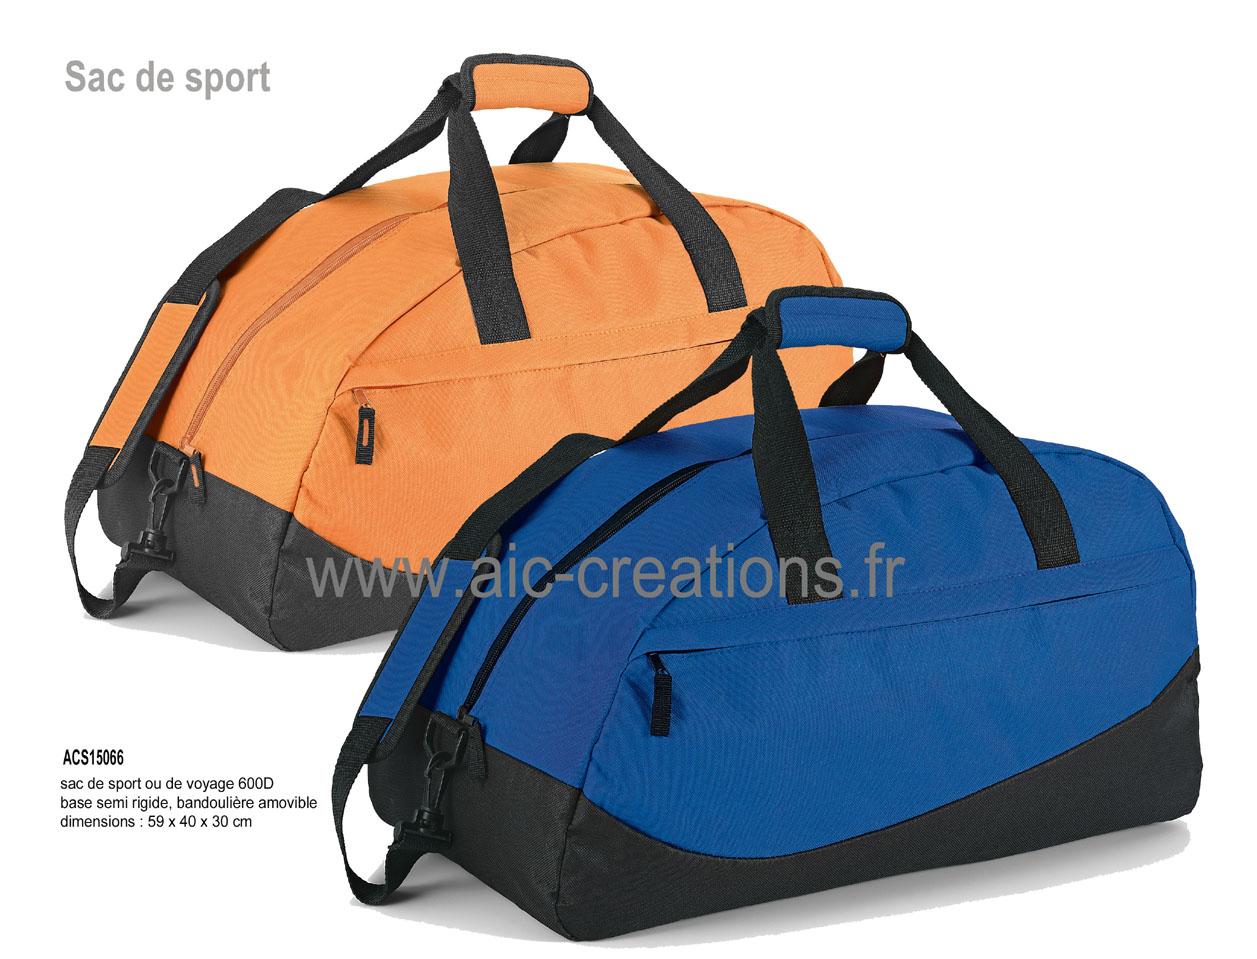 fe96e4080cbc9 ... sac de sport 600D base semi-rigide bandouliere amovible - ACS15066 x 60  : 10.16 € - x 100 9.95 € H.T